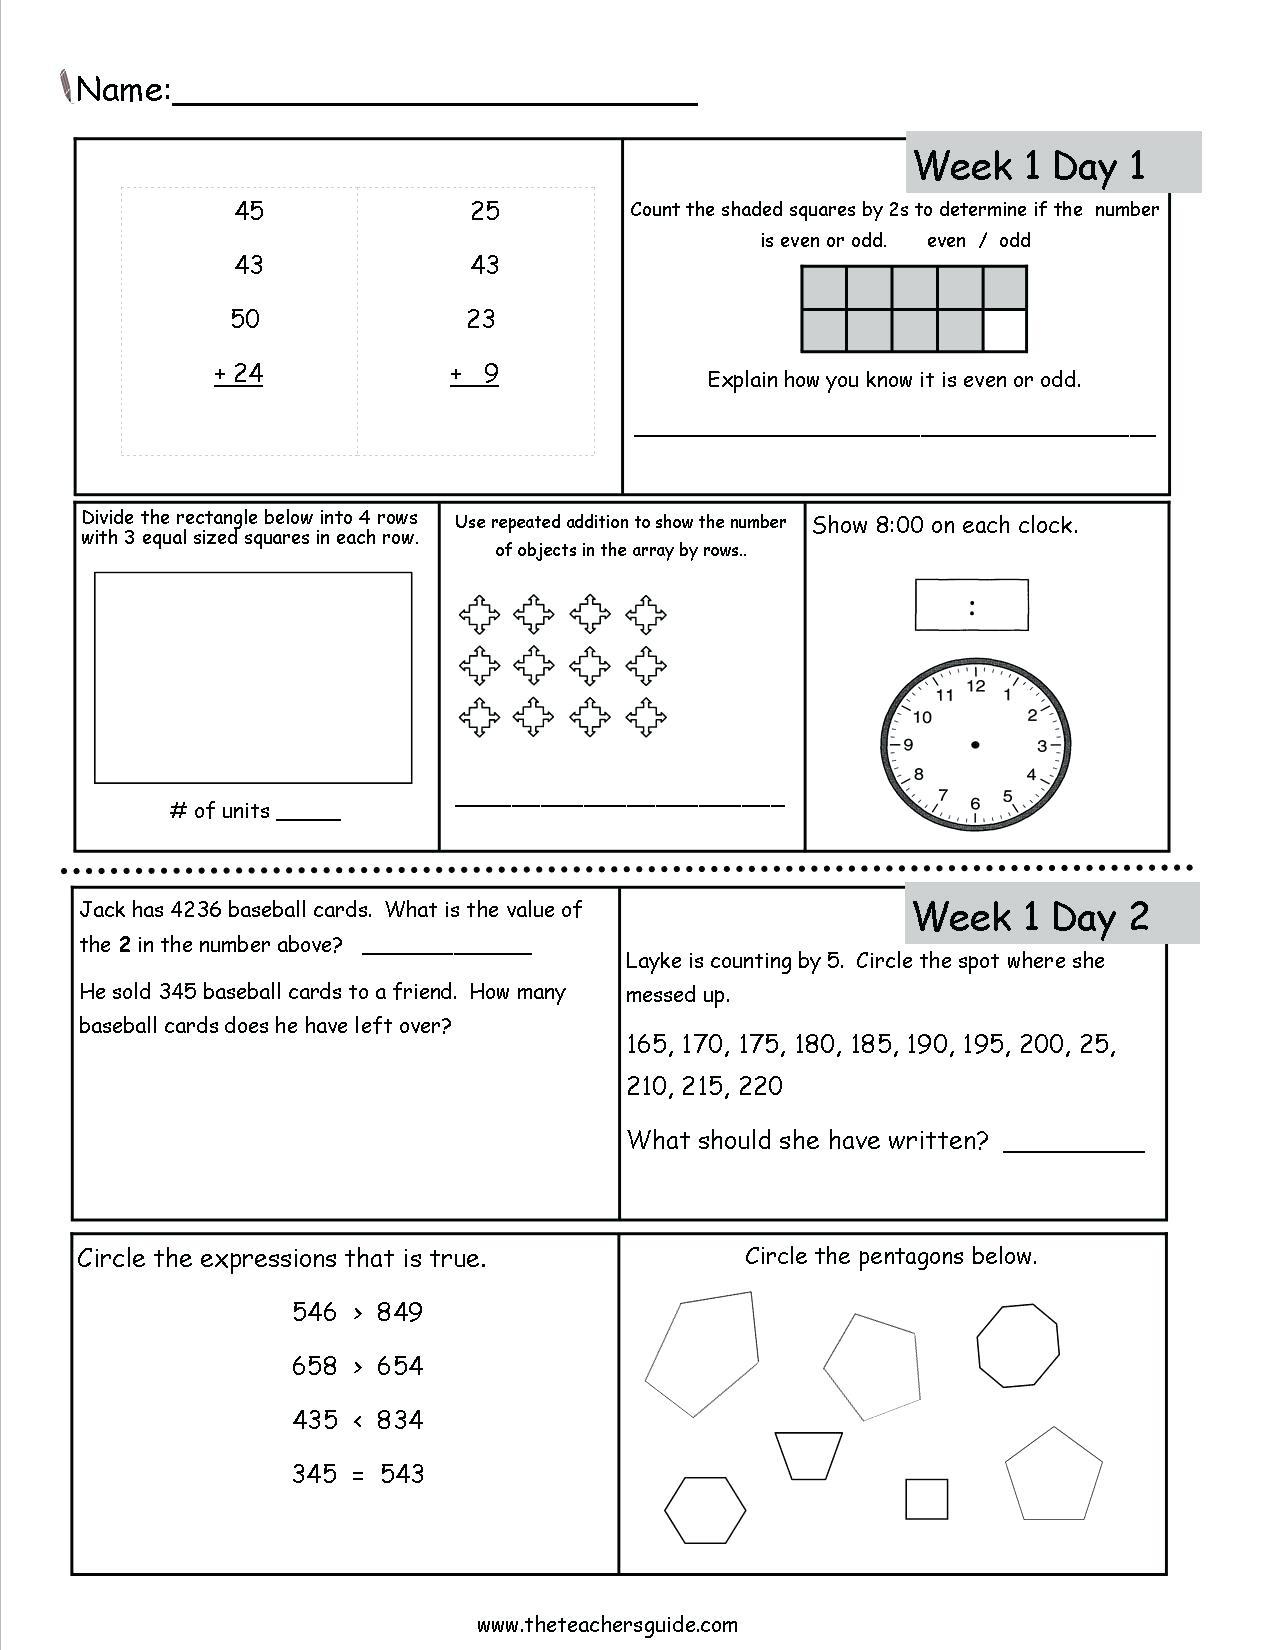 6th Grade Math And Reading Printable Worksheets